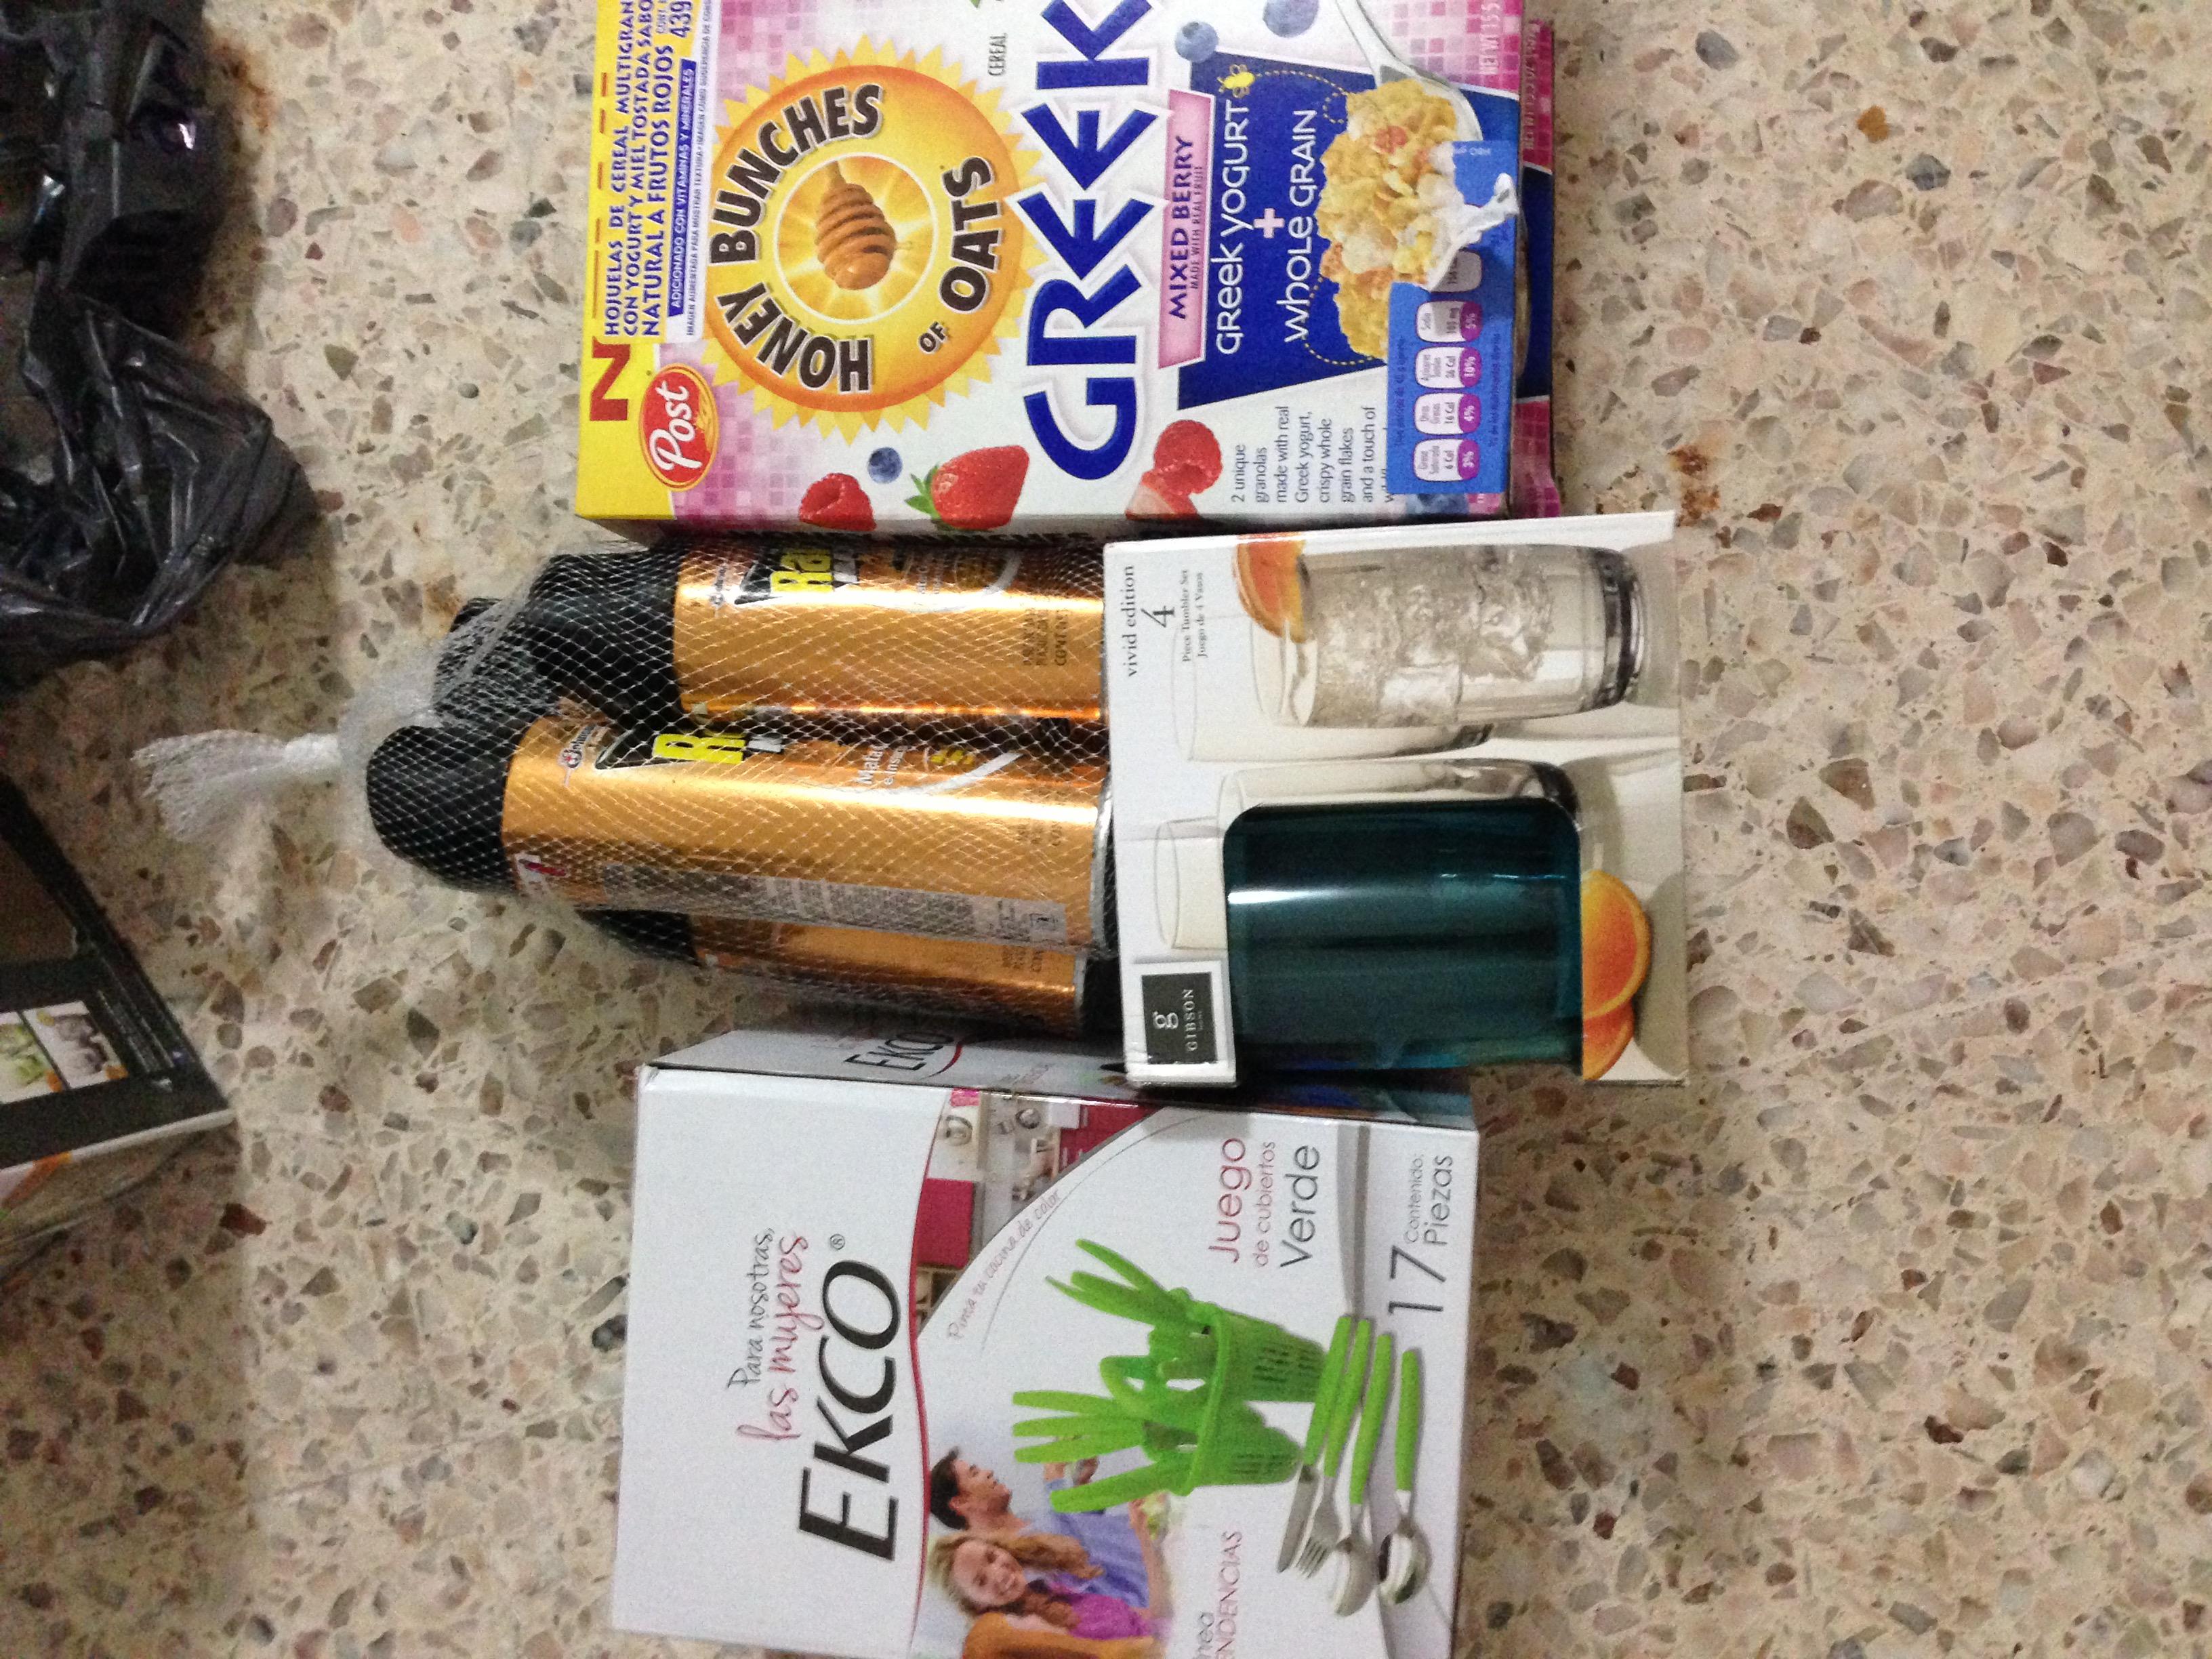 Walmart: cereal Honey Bunches GREEK $29.90, 4 vasos Gibson $35.02, paquete Raid Max 2 por $80